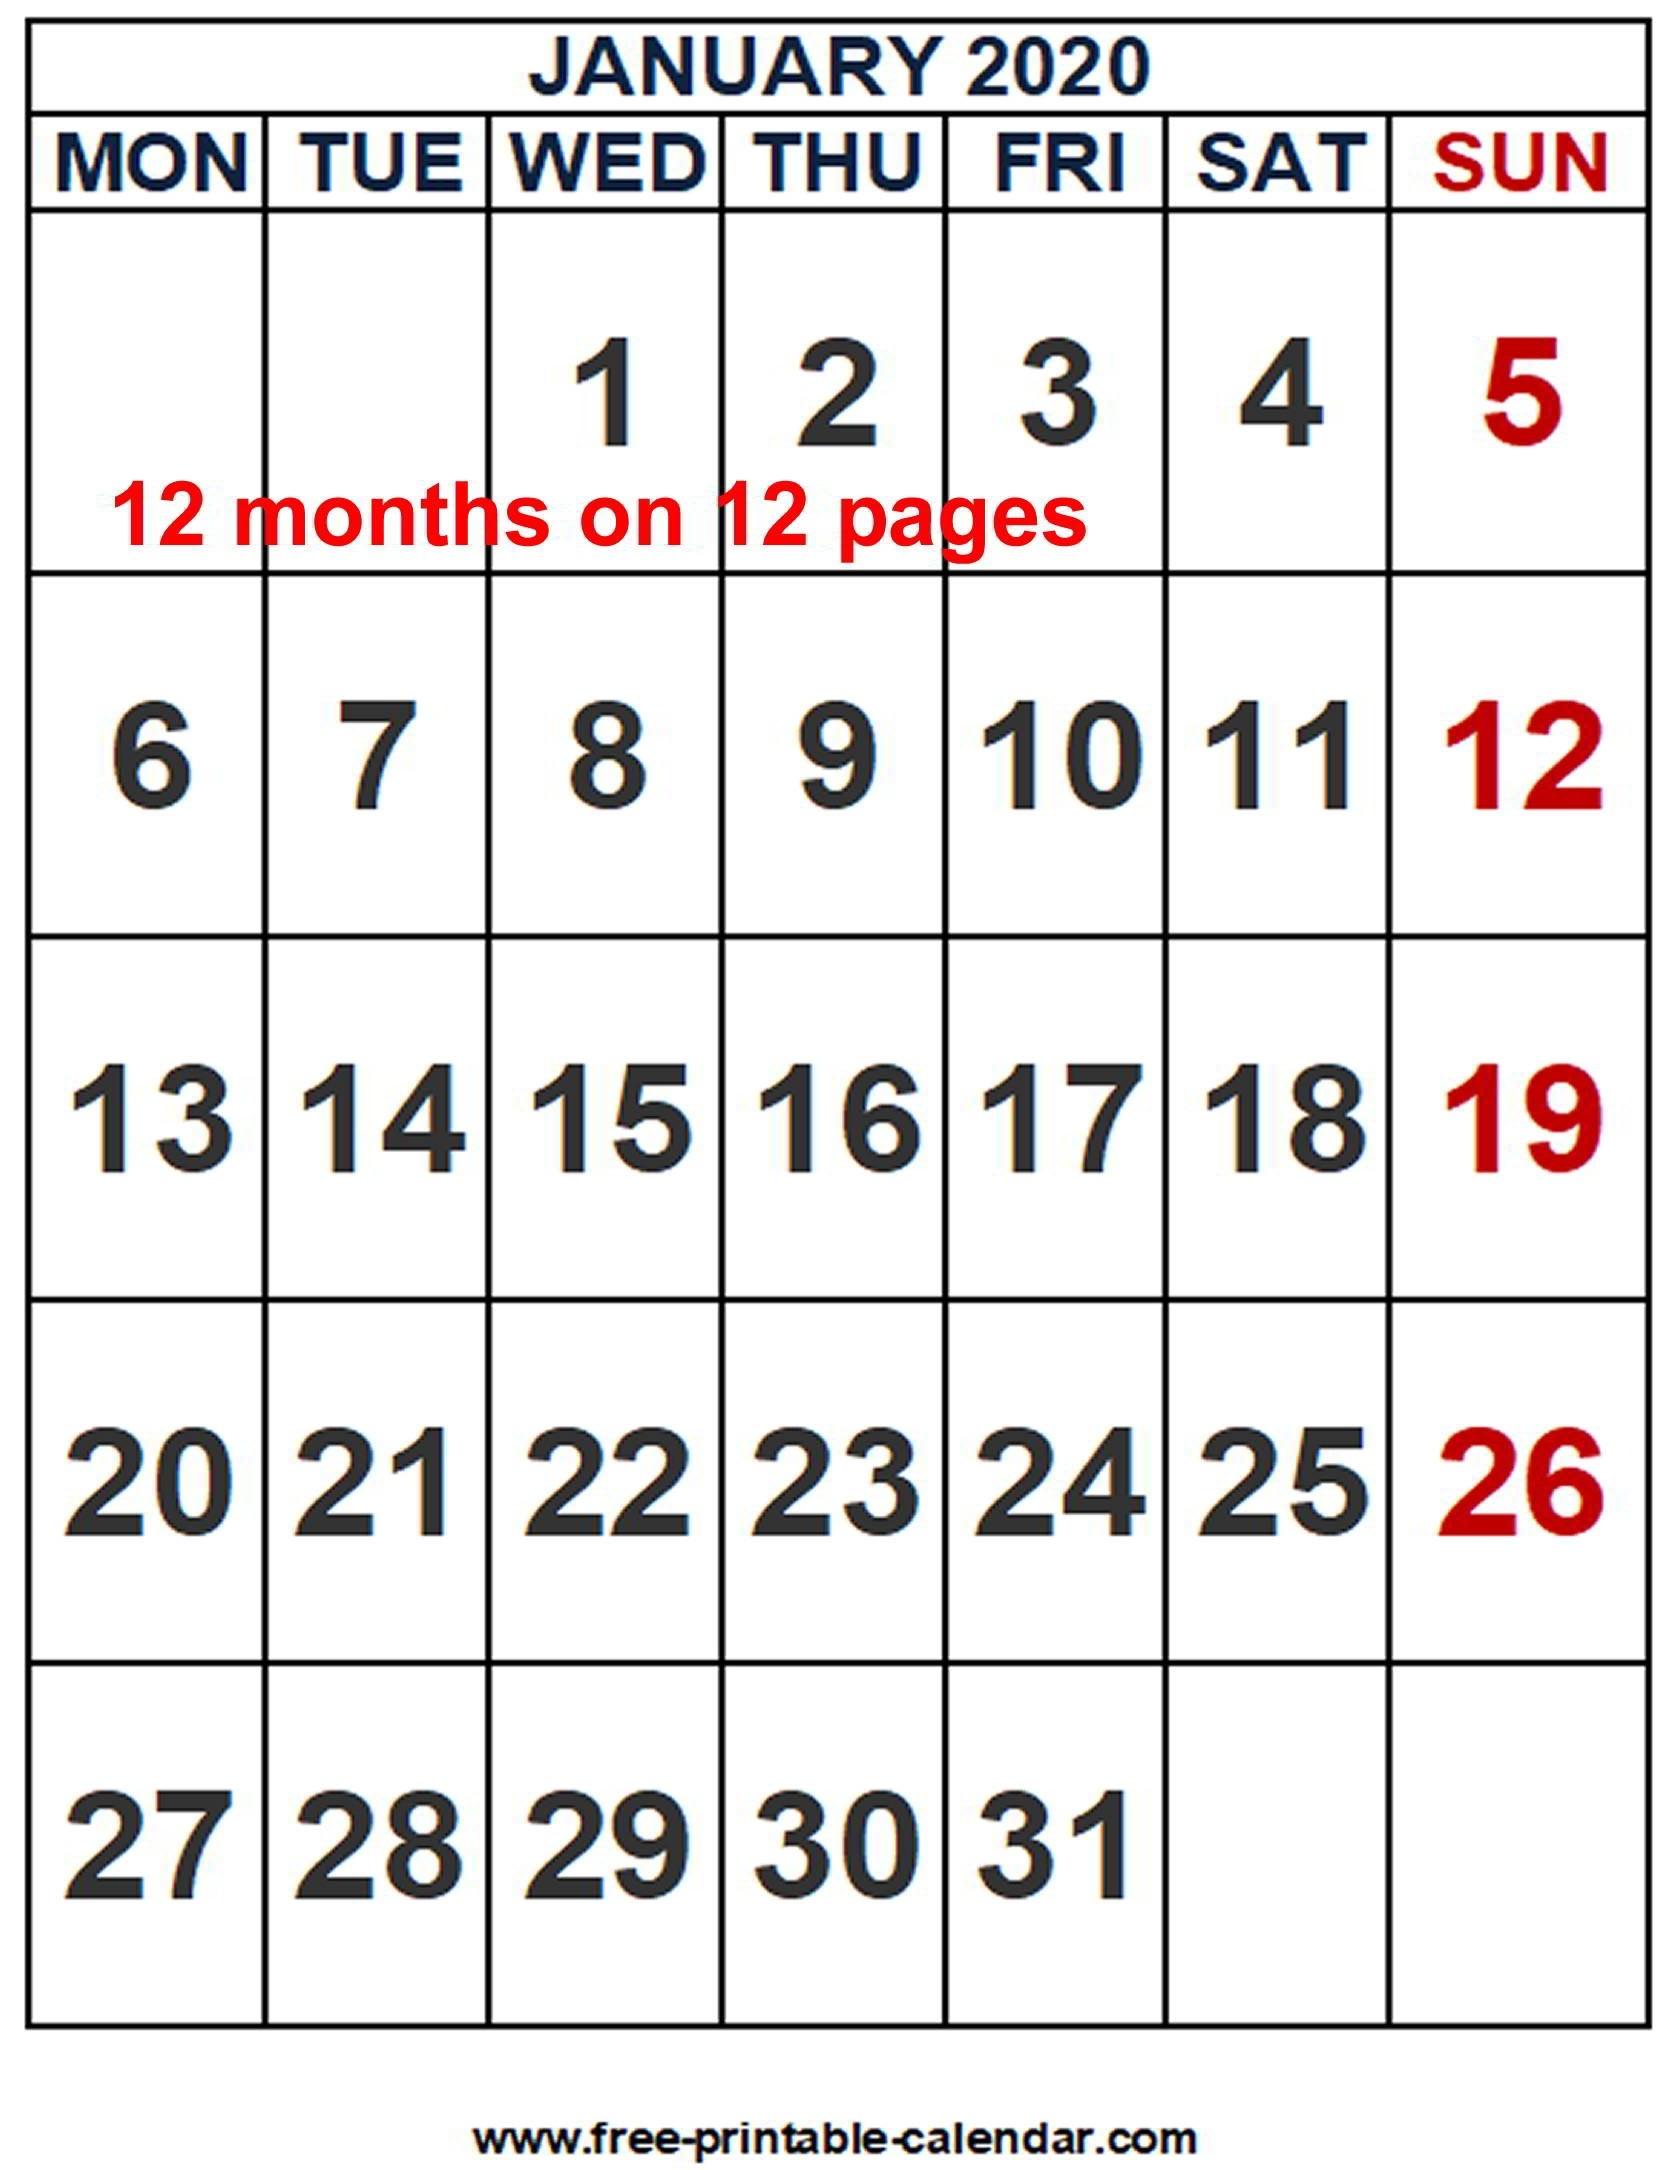 2020 Calendar Word Template - Free-Printable-Calendar-Microsoft Word Calendar Template 2020 Edit